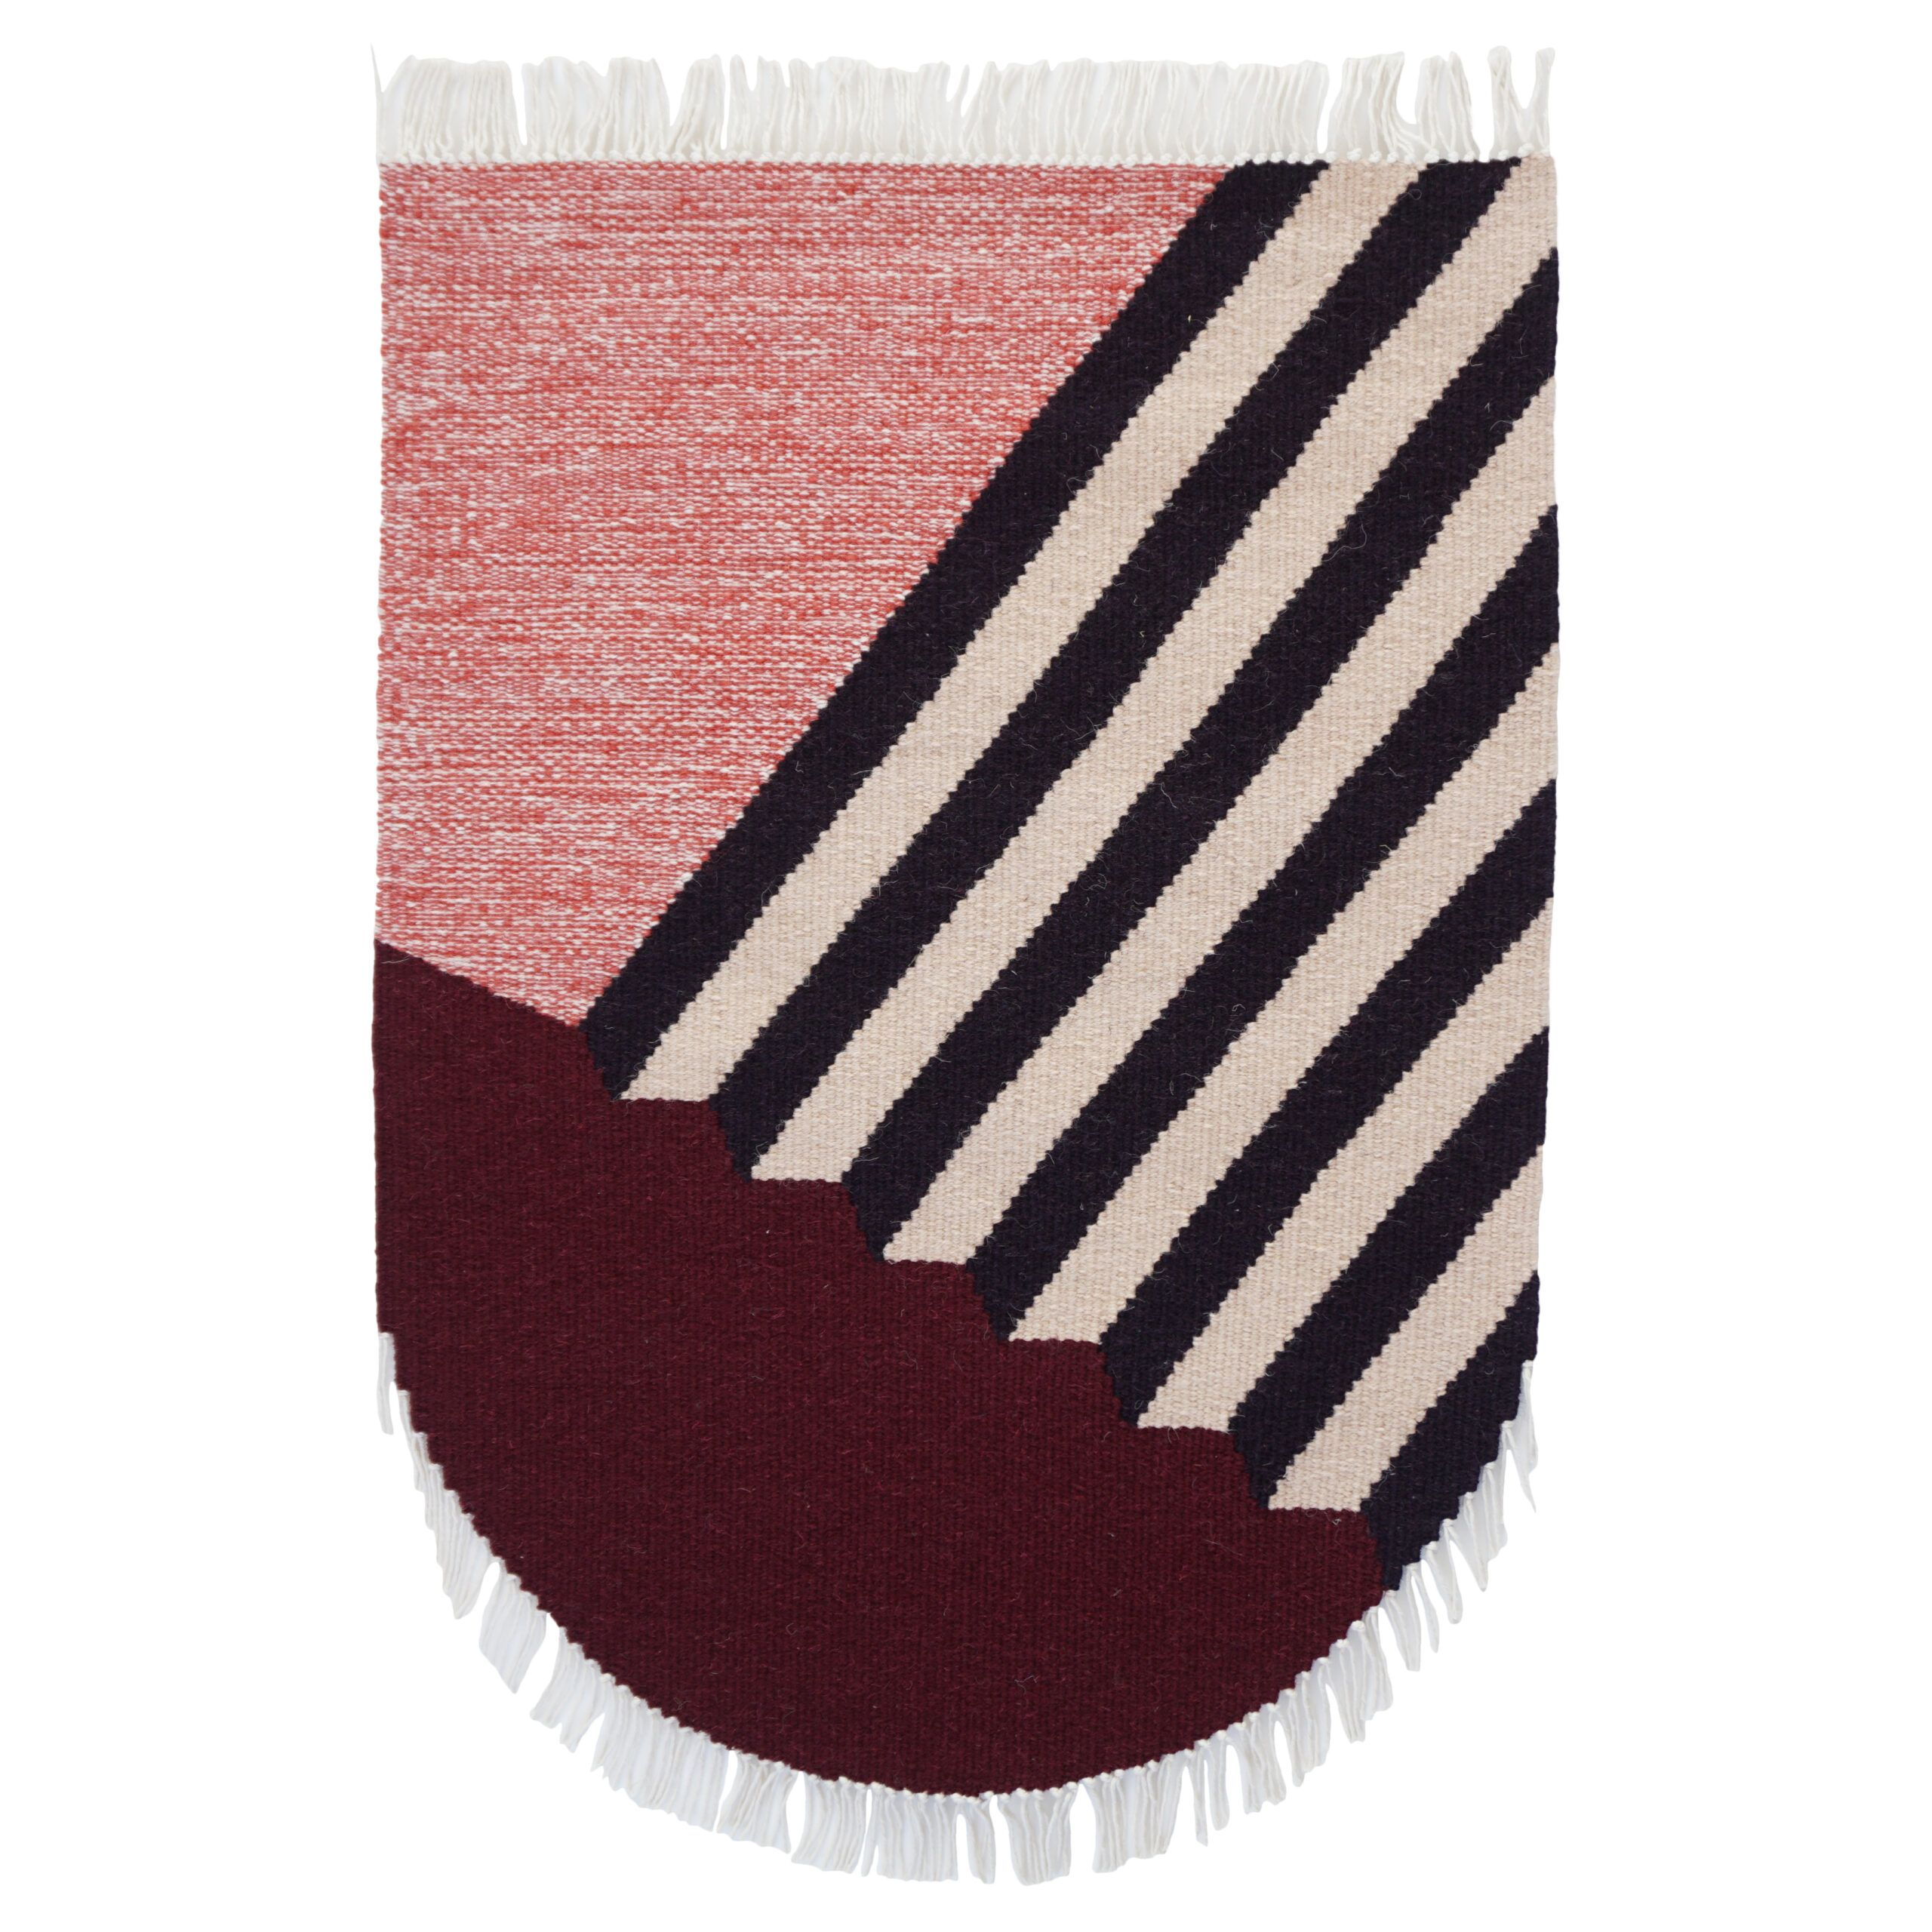 RAAG - a hand woven flat area rug, modern kilim by Tartaruga and Un'common #modernrug #modernkilim #kilim #walldecoration #wallart #wallhanging #kilimonthewall #kilim #rug #handwoven #localproduction #zerowaste #woolenrug #recycledyarn #recycledmaterials #sustainabledesign #sustainableproduction #lesswaste #arearug #weaving #modernweaving #floorloom #weavingstudio #vintagelovers #vintagedecor #handcrafted #newvintage #wool